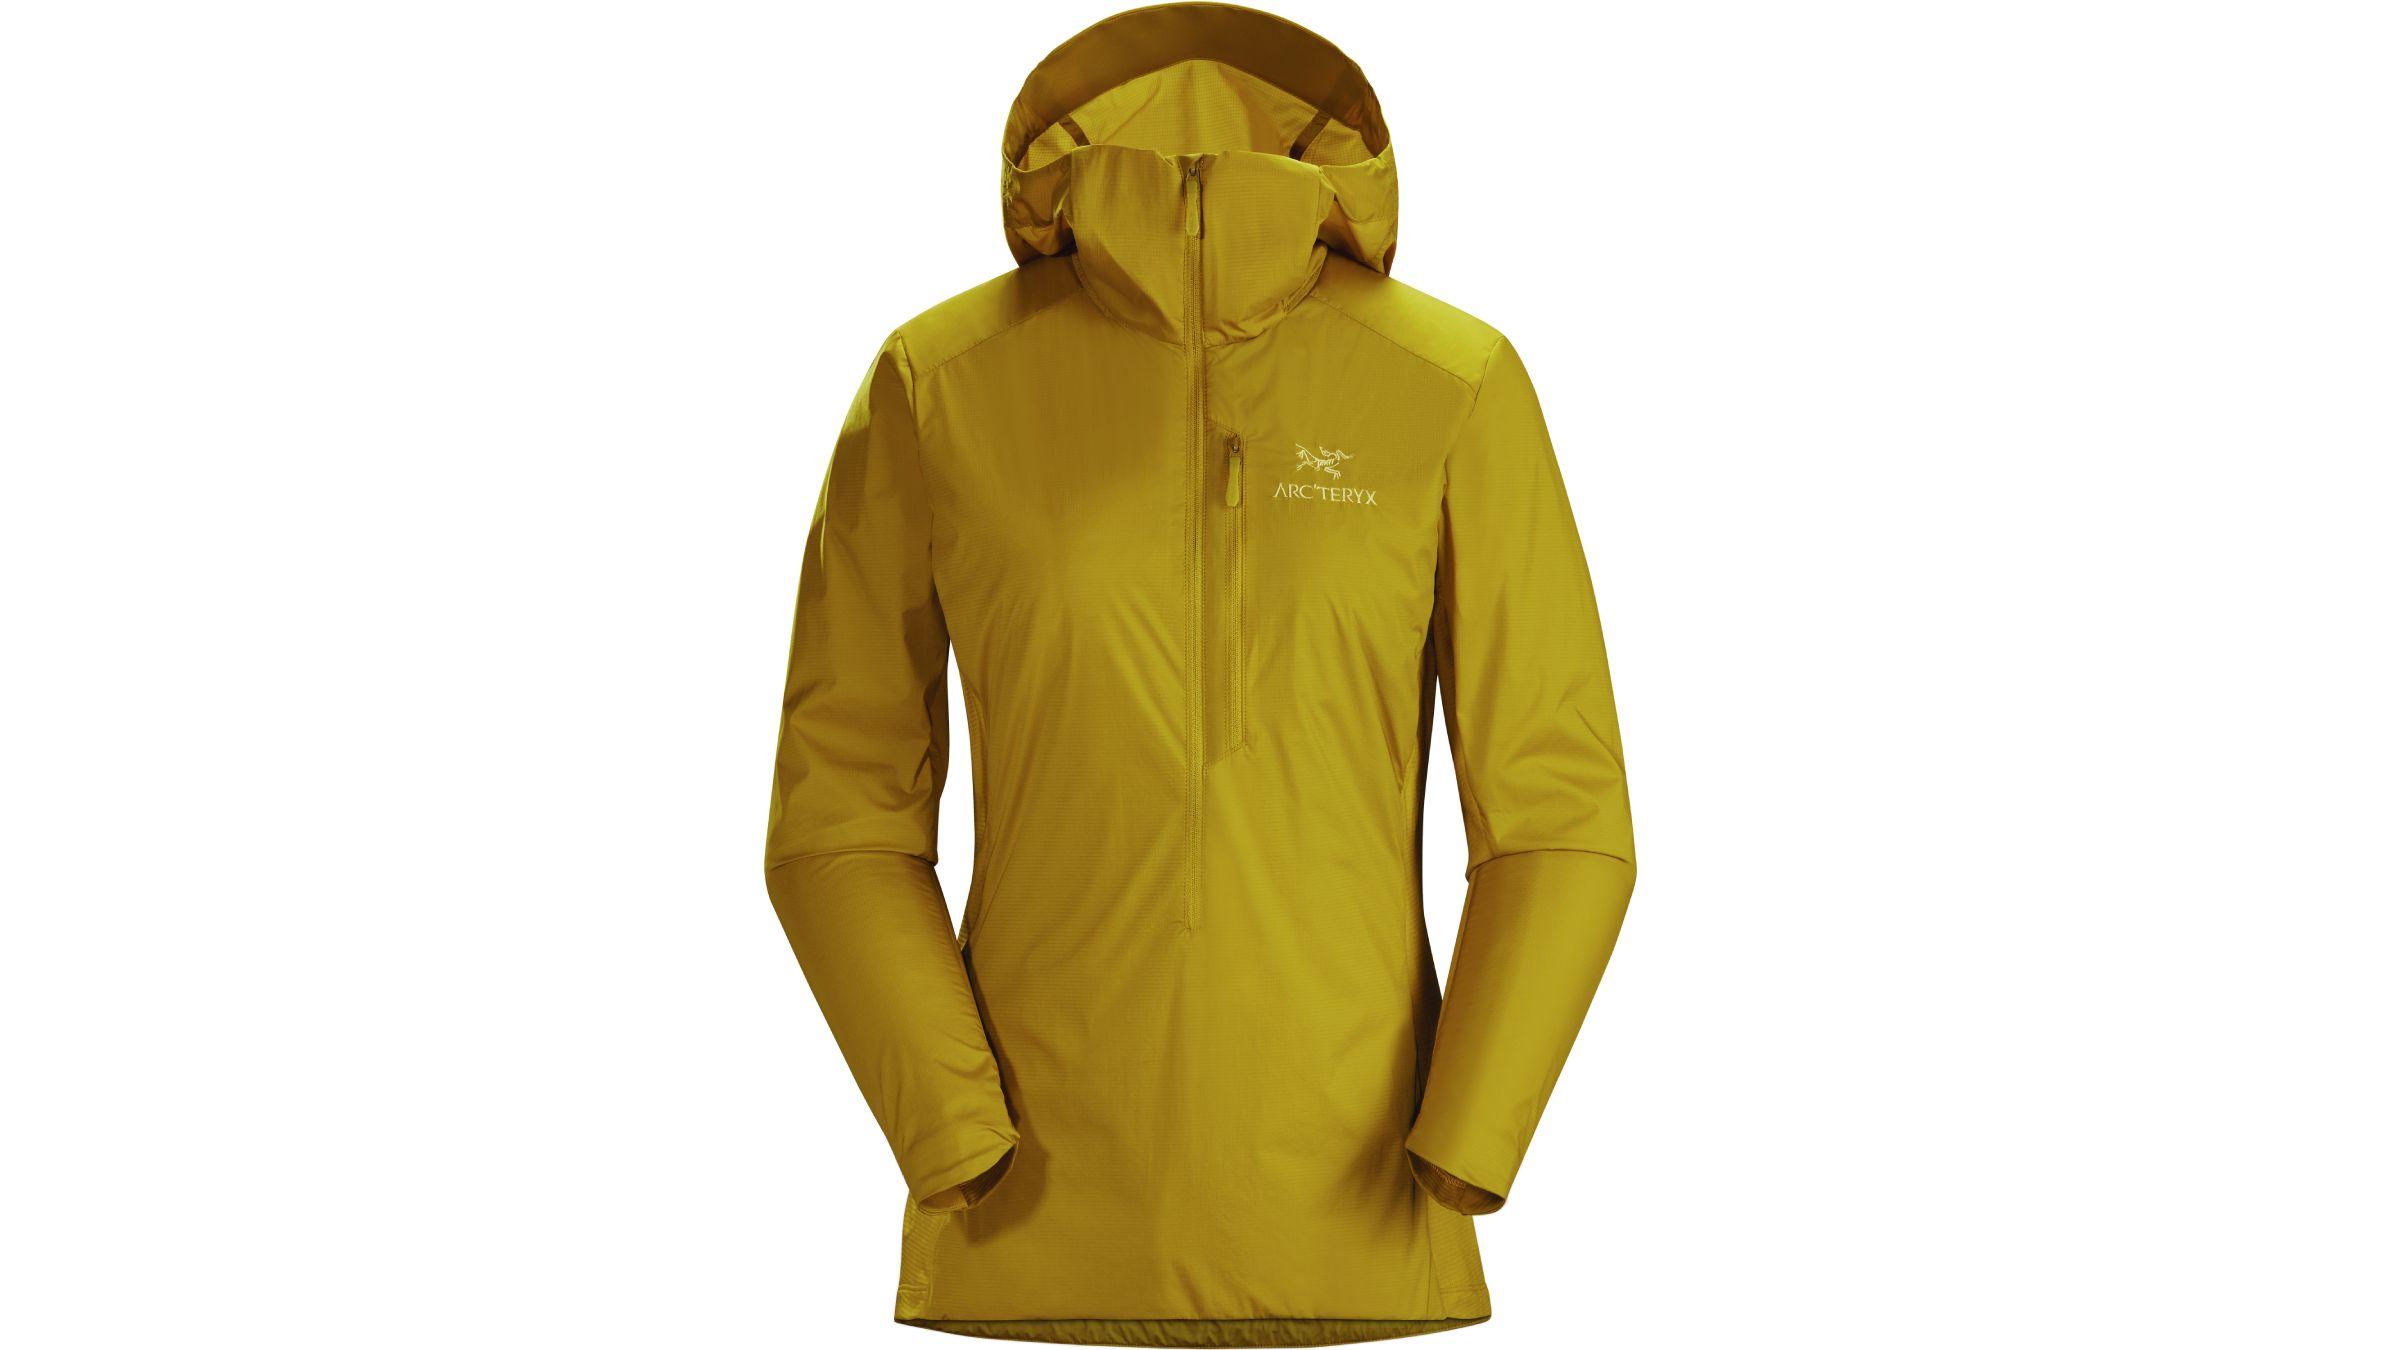 Mustard yellow Arc'teryx Atom SL hoodie